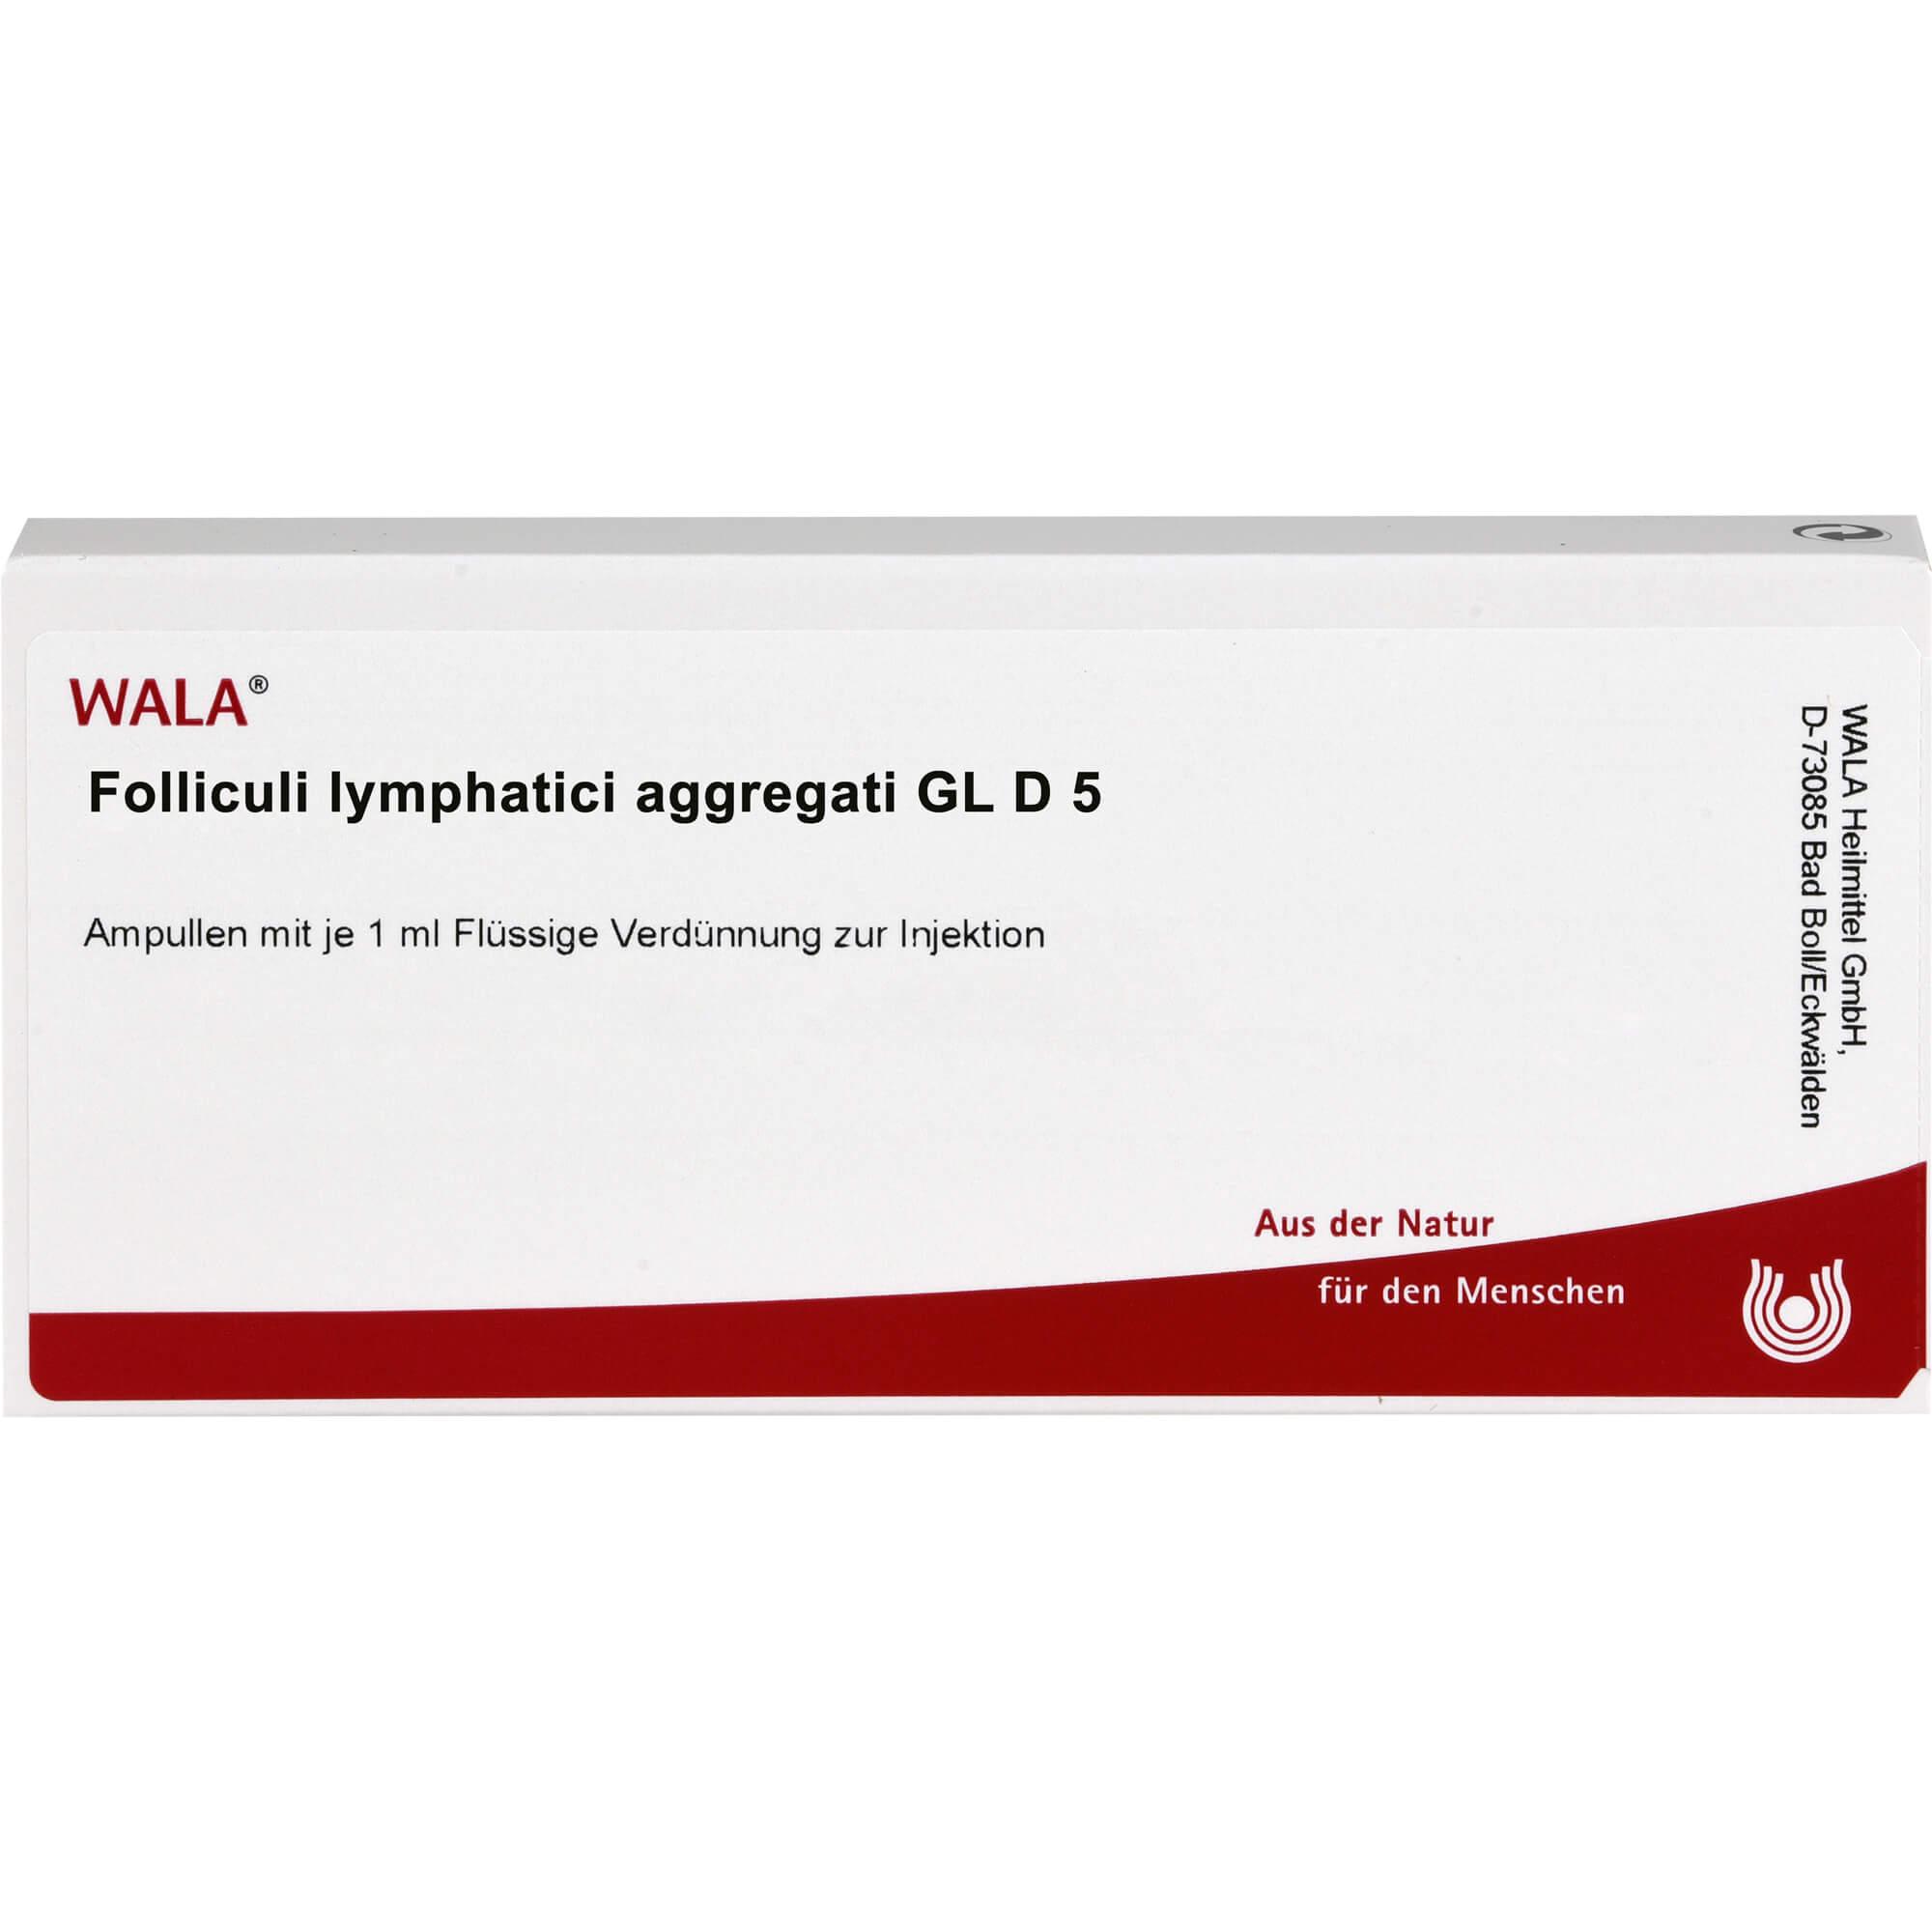 FOLLICULI LYMPHATICI aggregati GL D 5 Ampullen